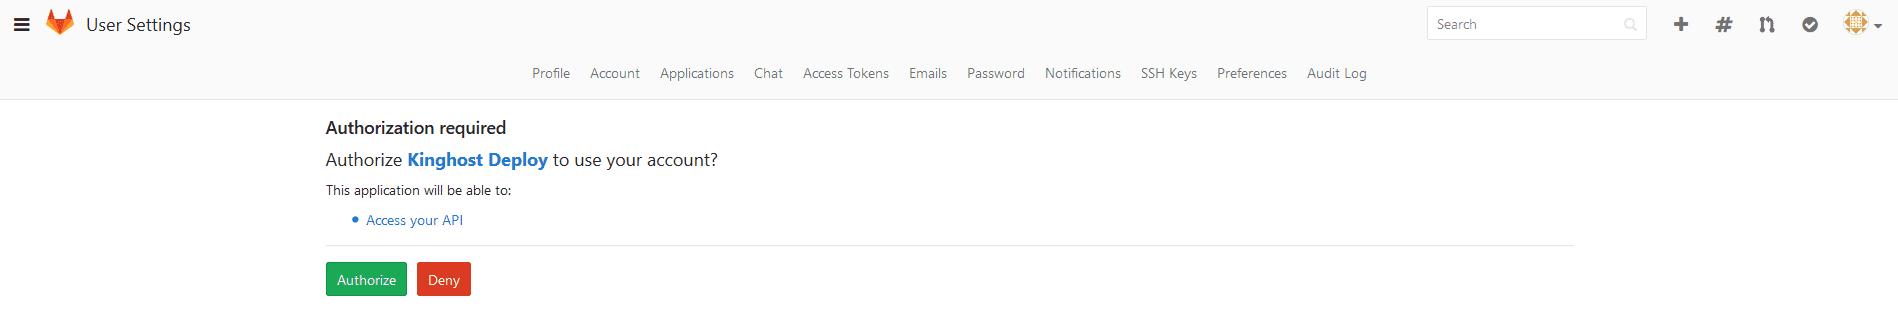 GitLab na KingHost - Integrando ao Painel de Controle